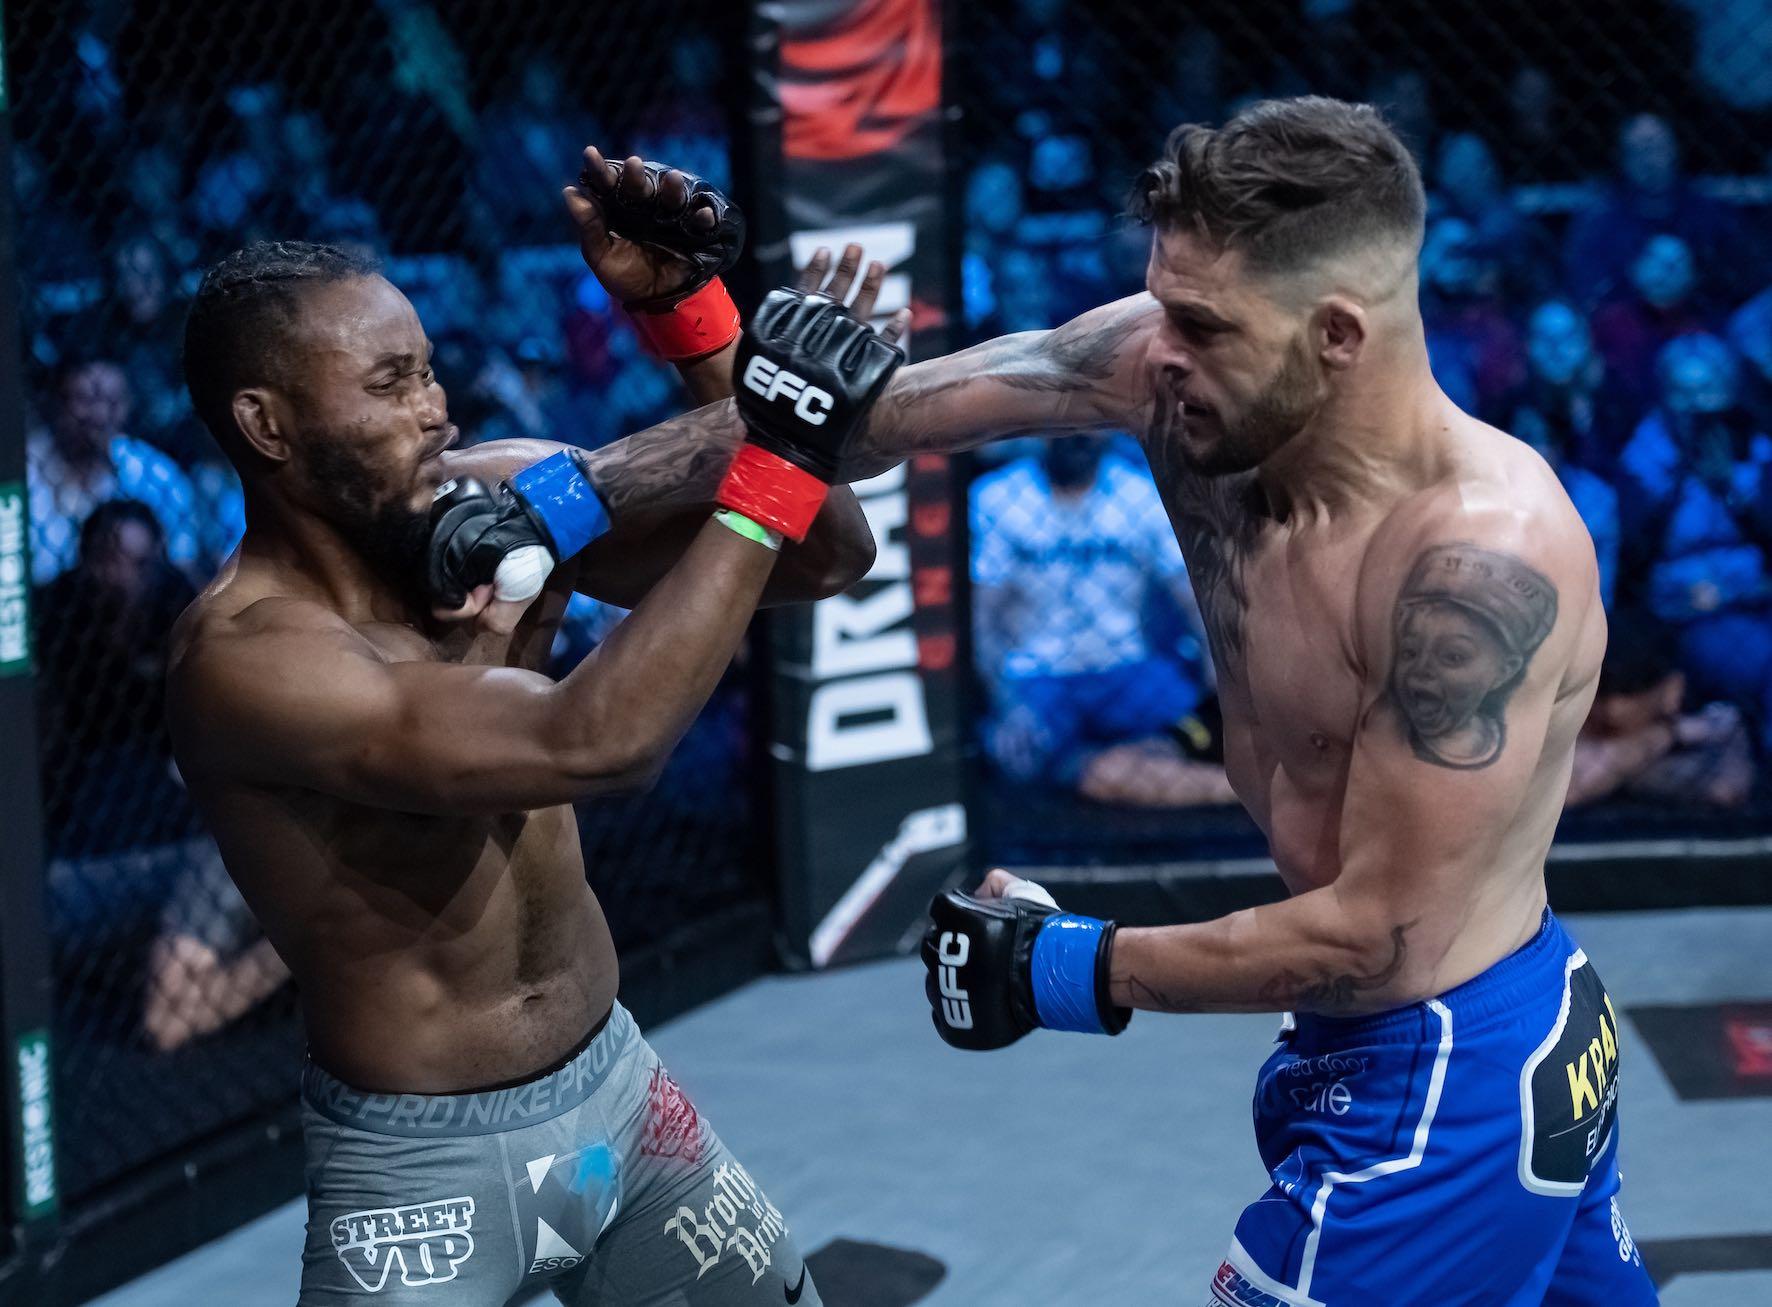 Dino Bagattin vs Anicet Kanyeba at EFC 81